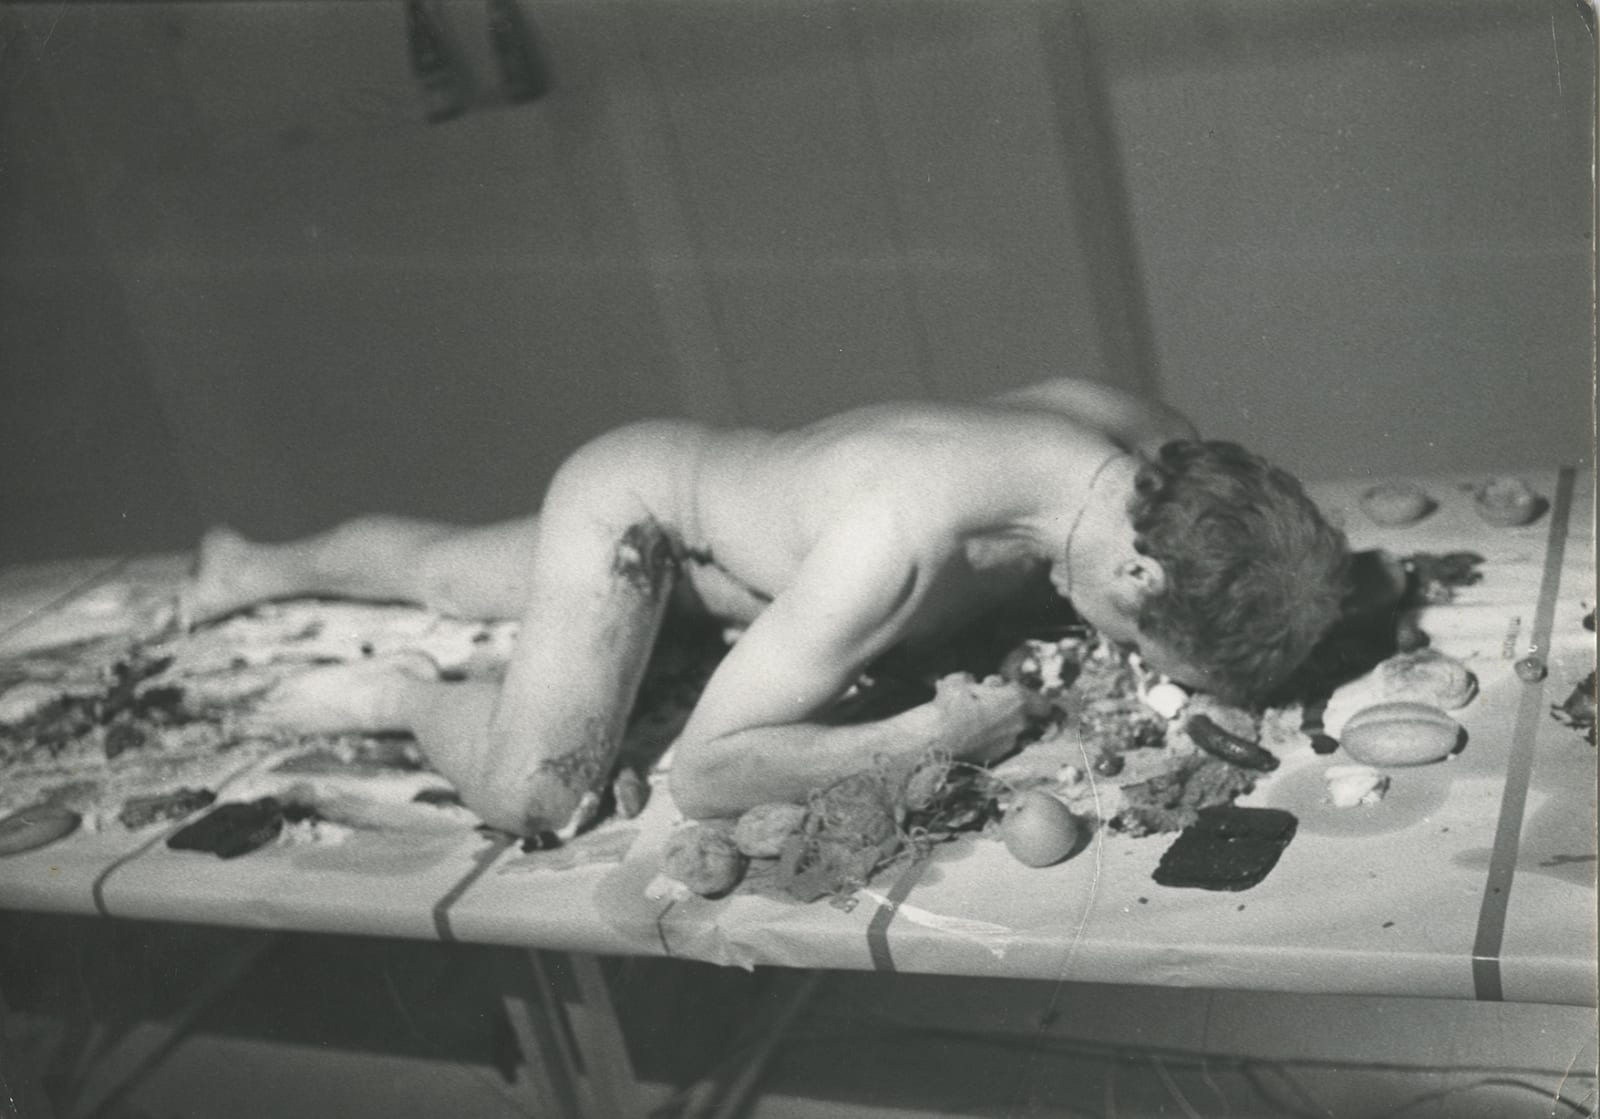 Stuart Brisley, 10 Days, 1973 performance documentation